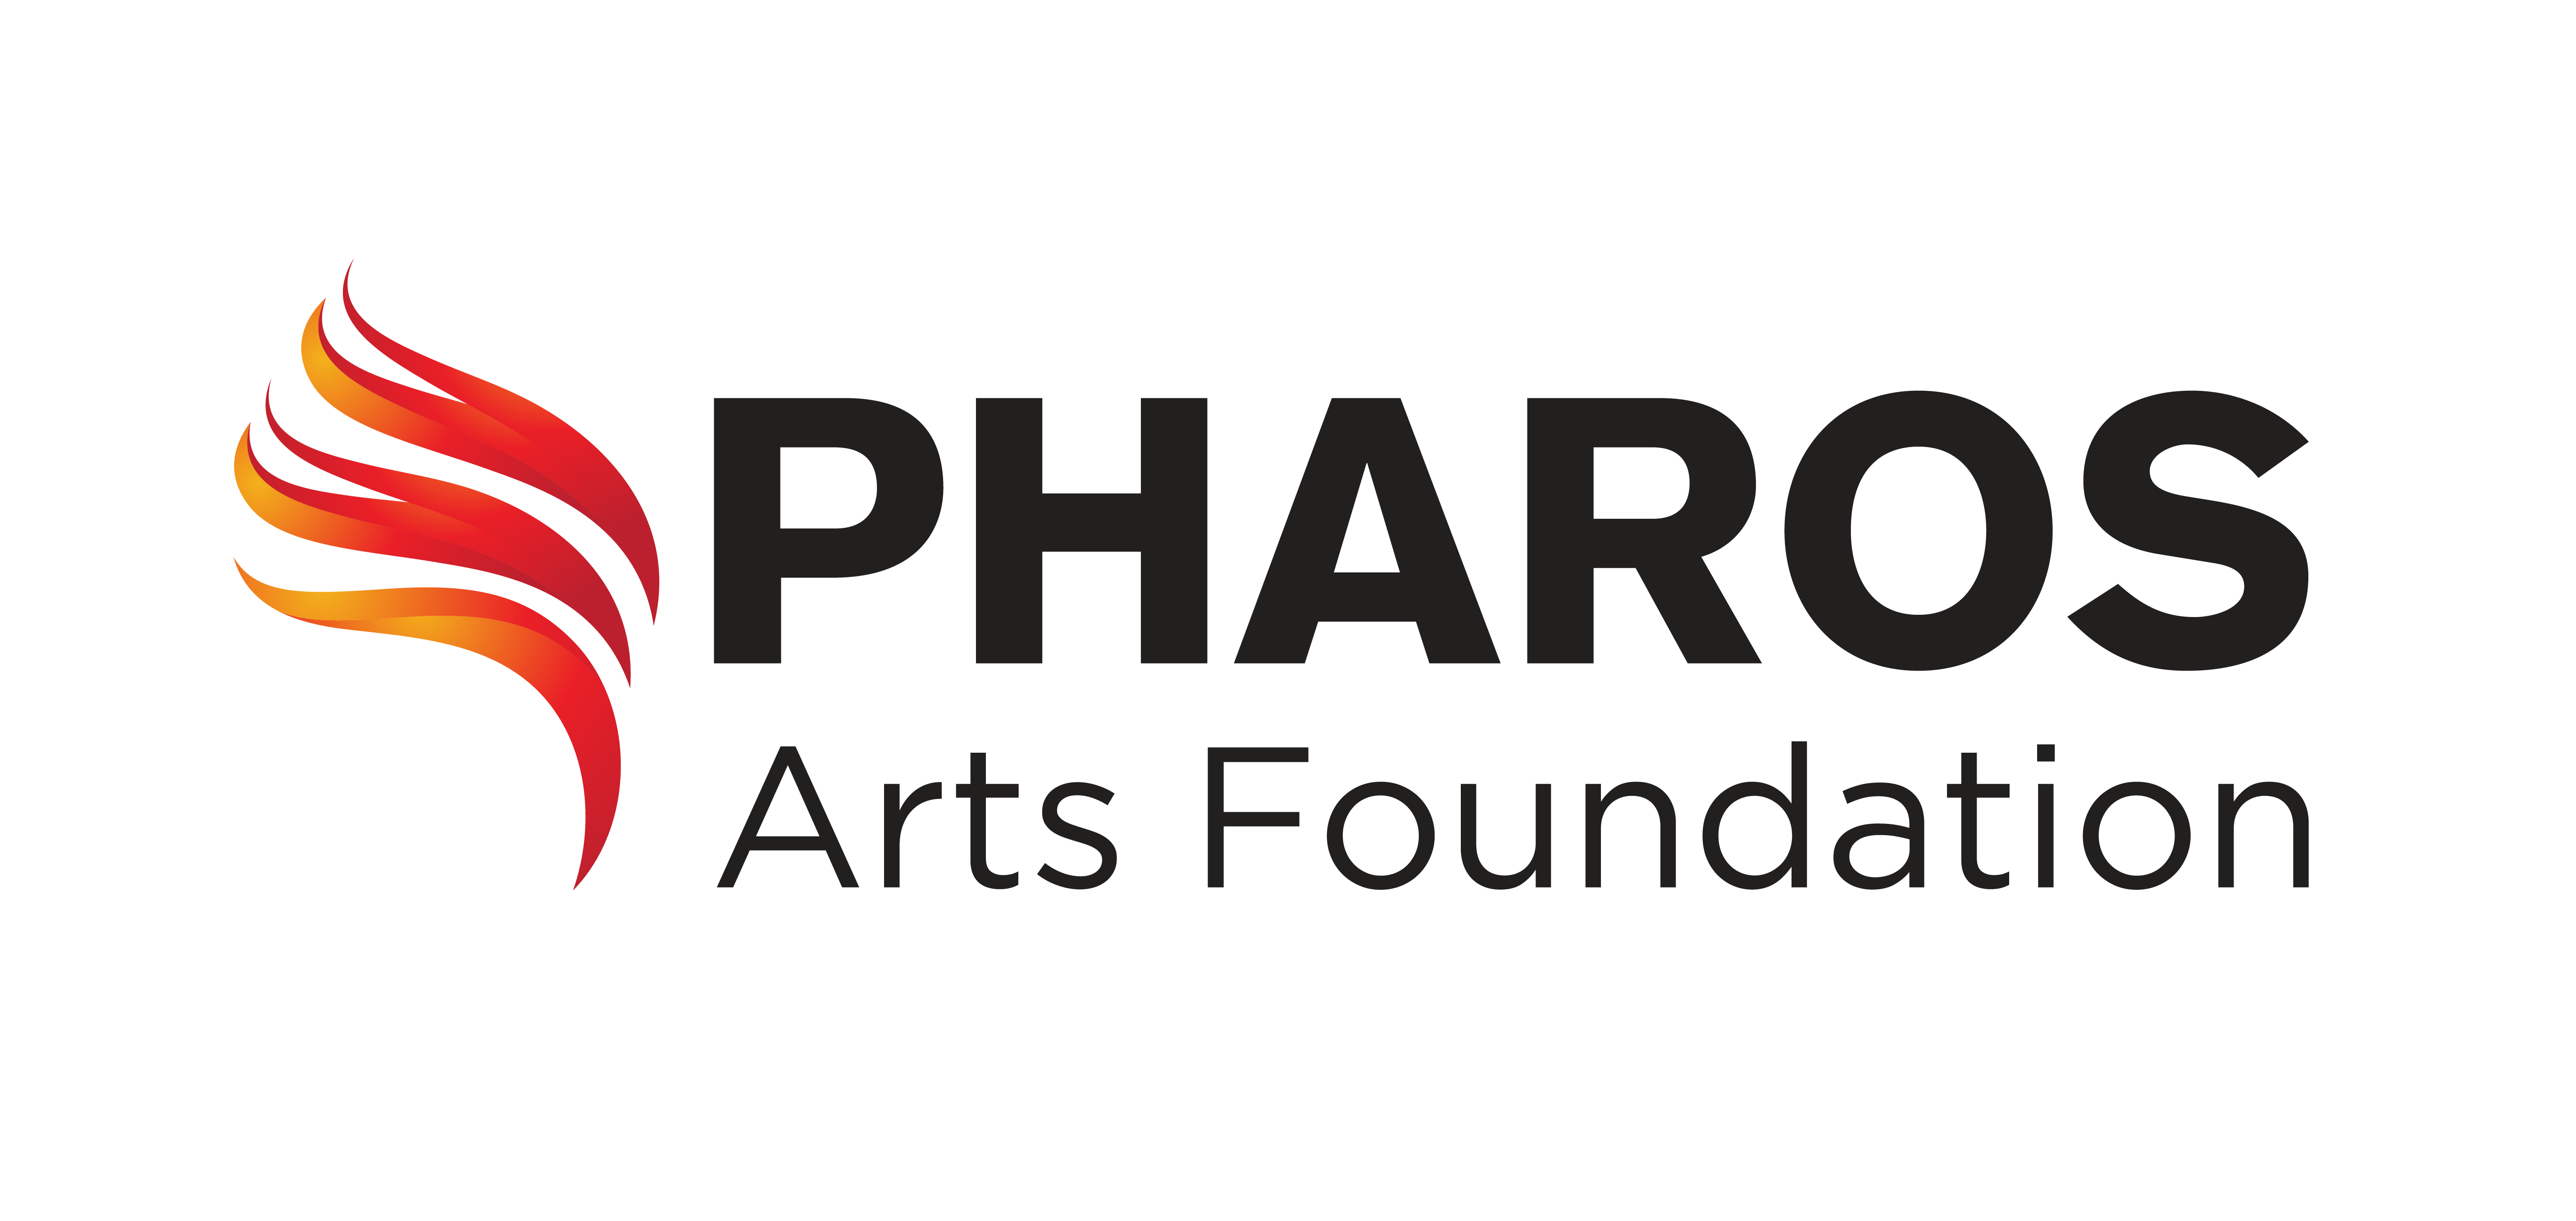 PHAROS Arts Foundation